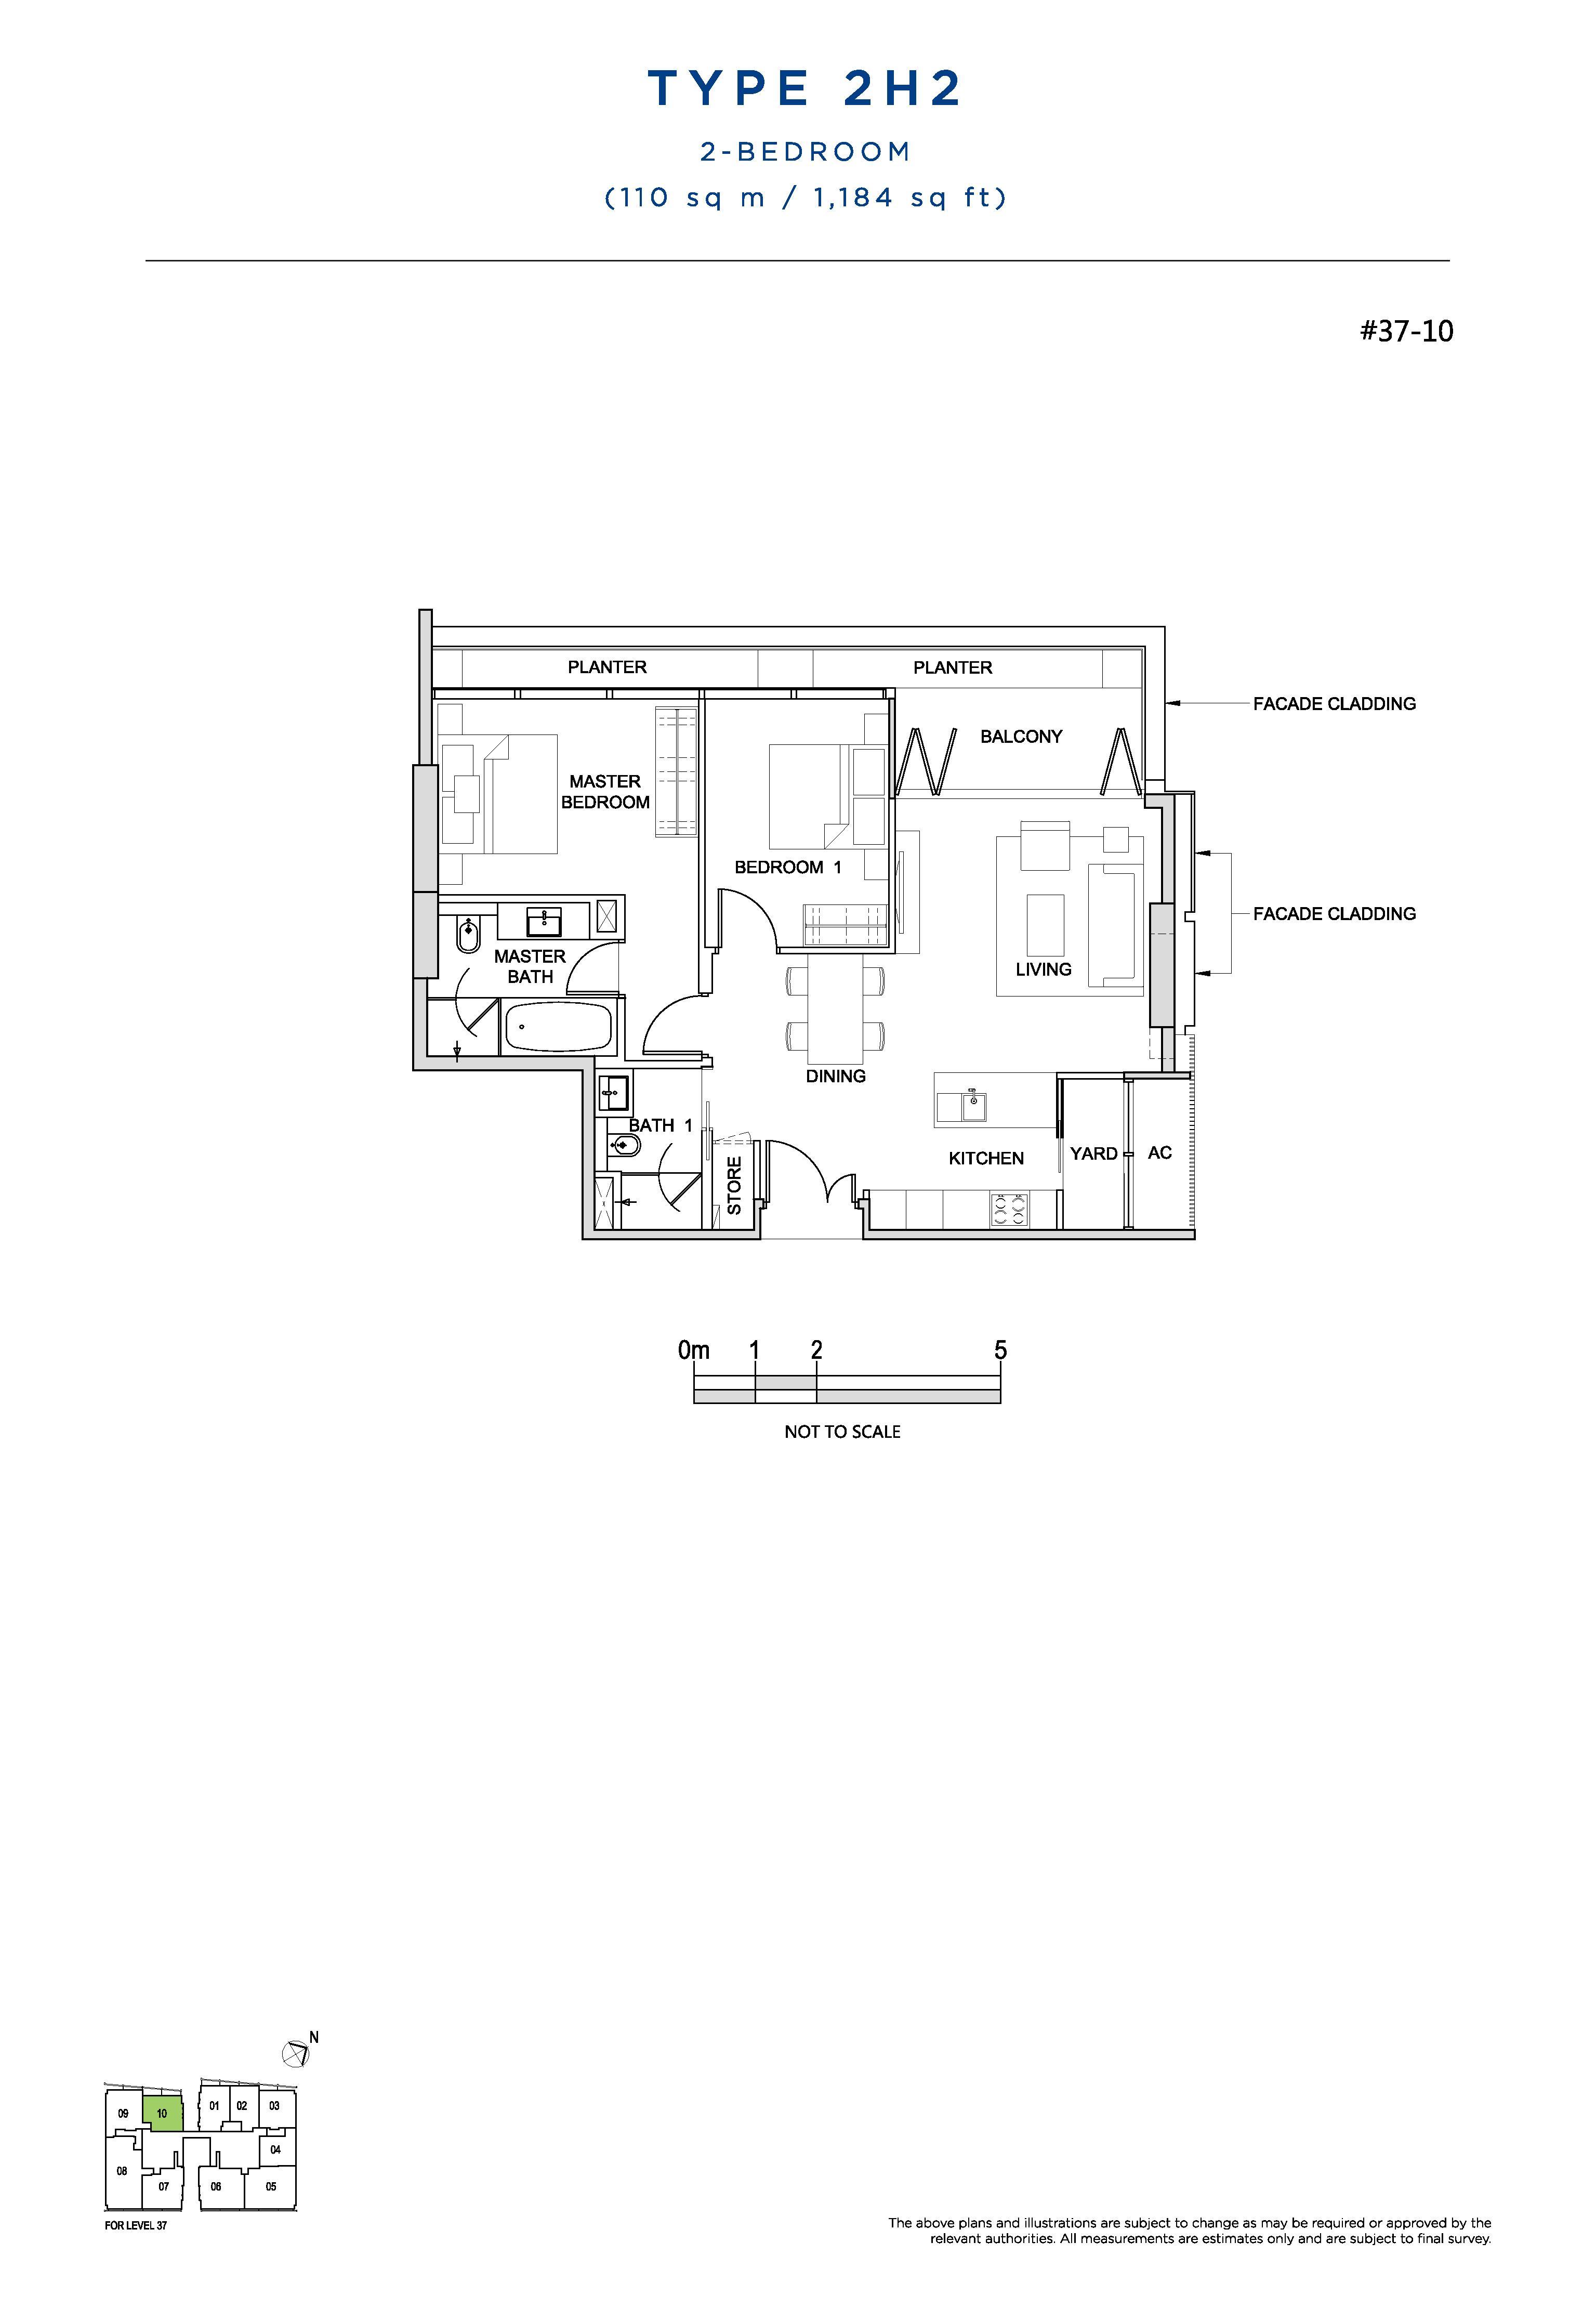 South Beach Residences 2 Bedroom Floor Plans Type 2H2